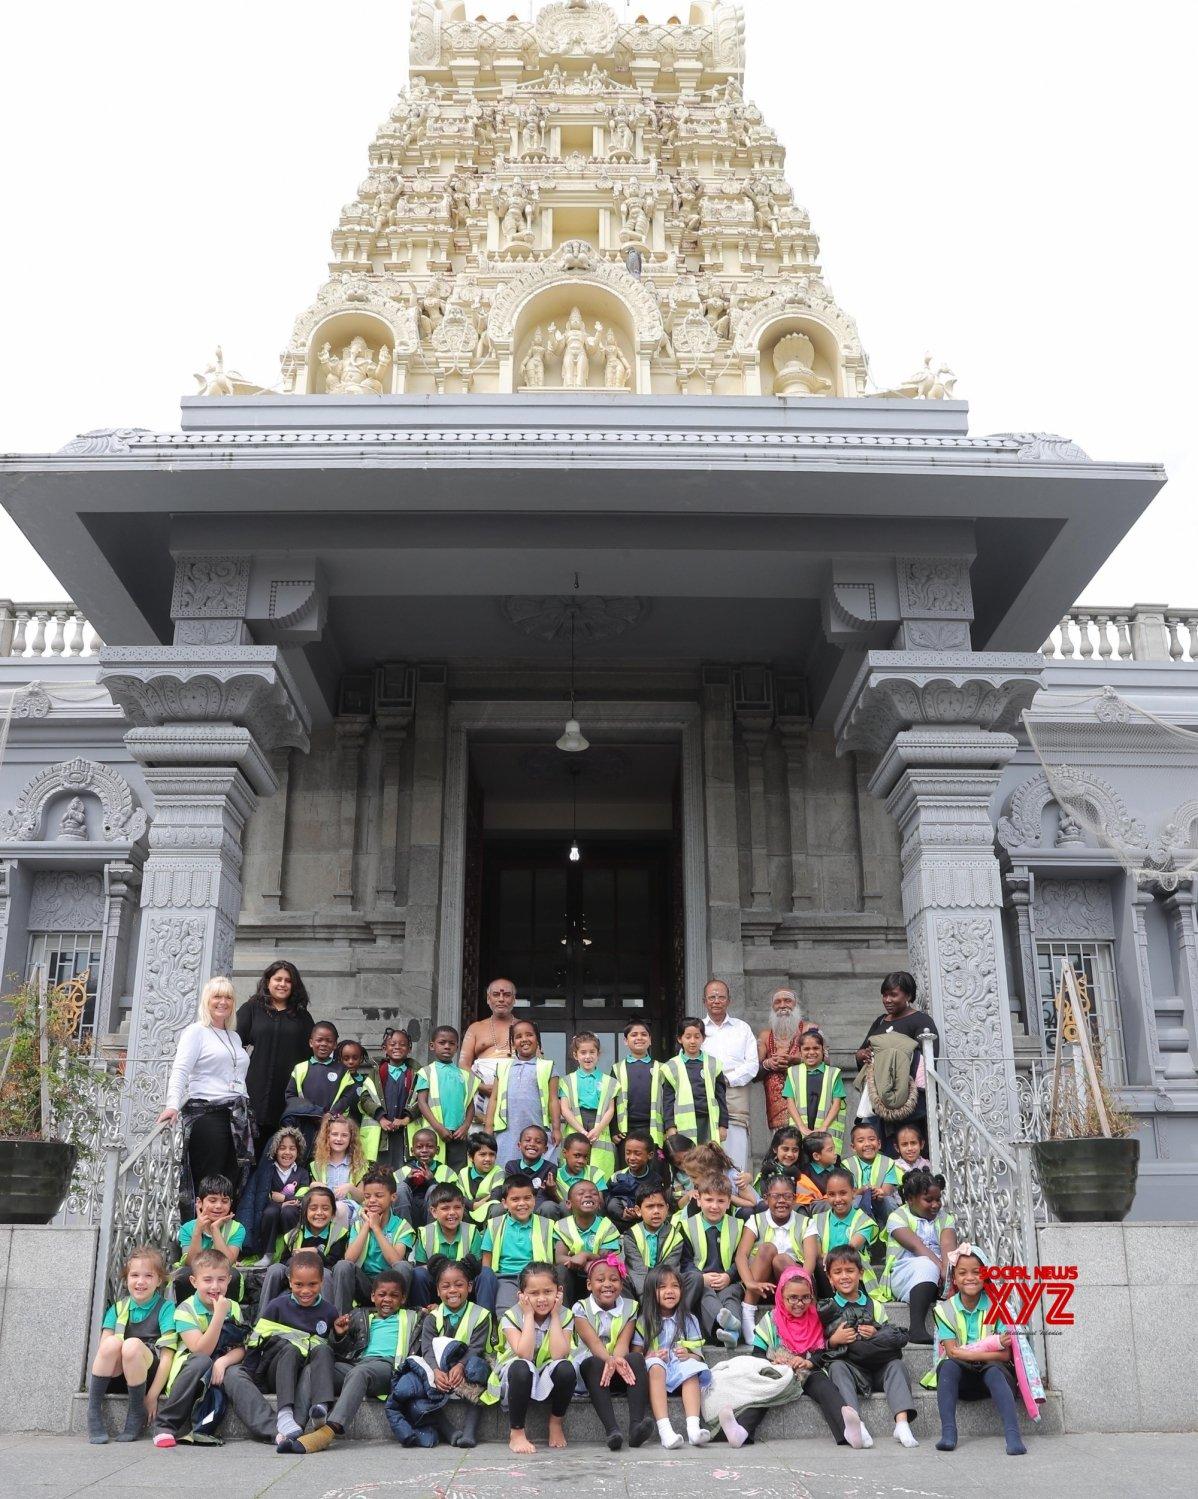 London: School children visit London Murugan Temple #Gallery